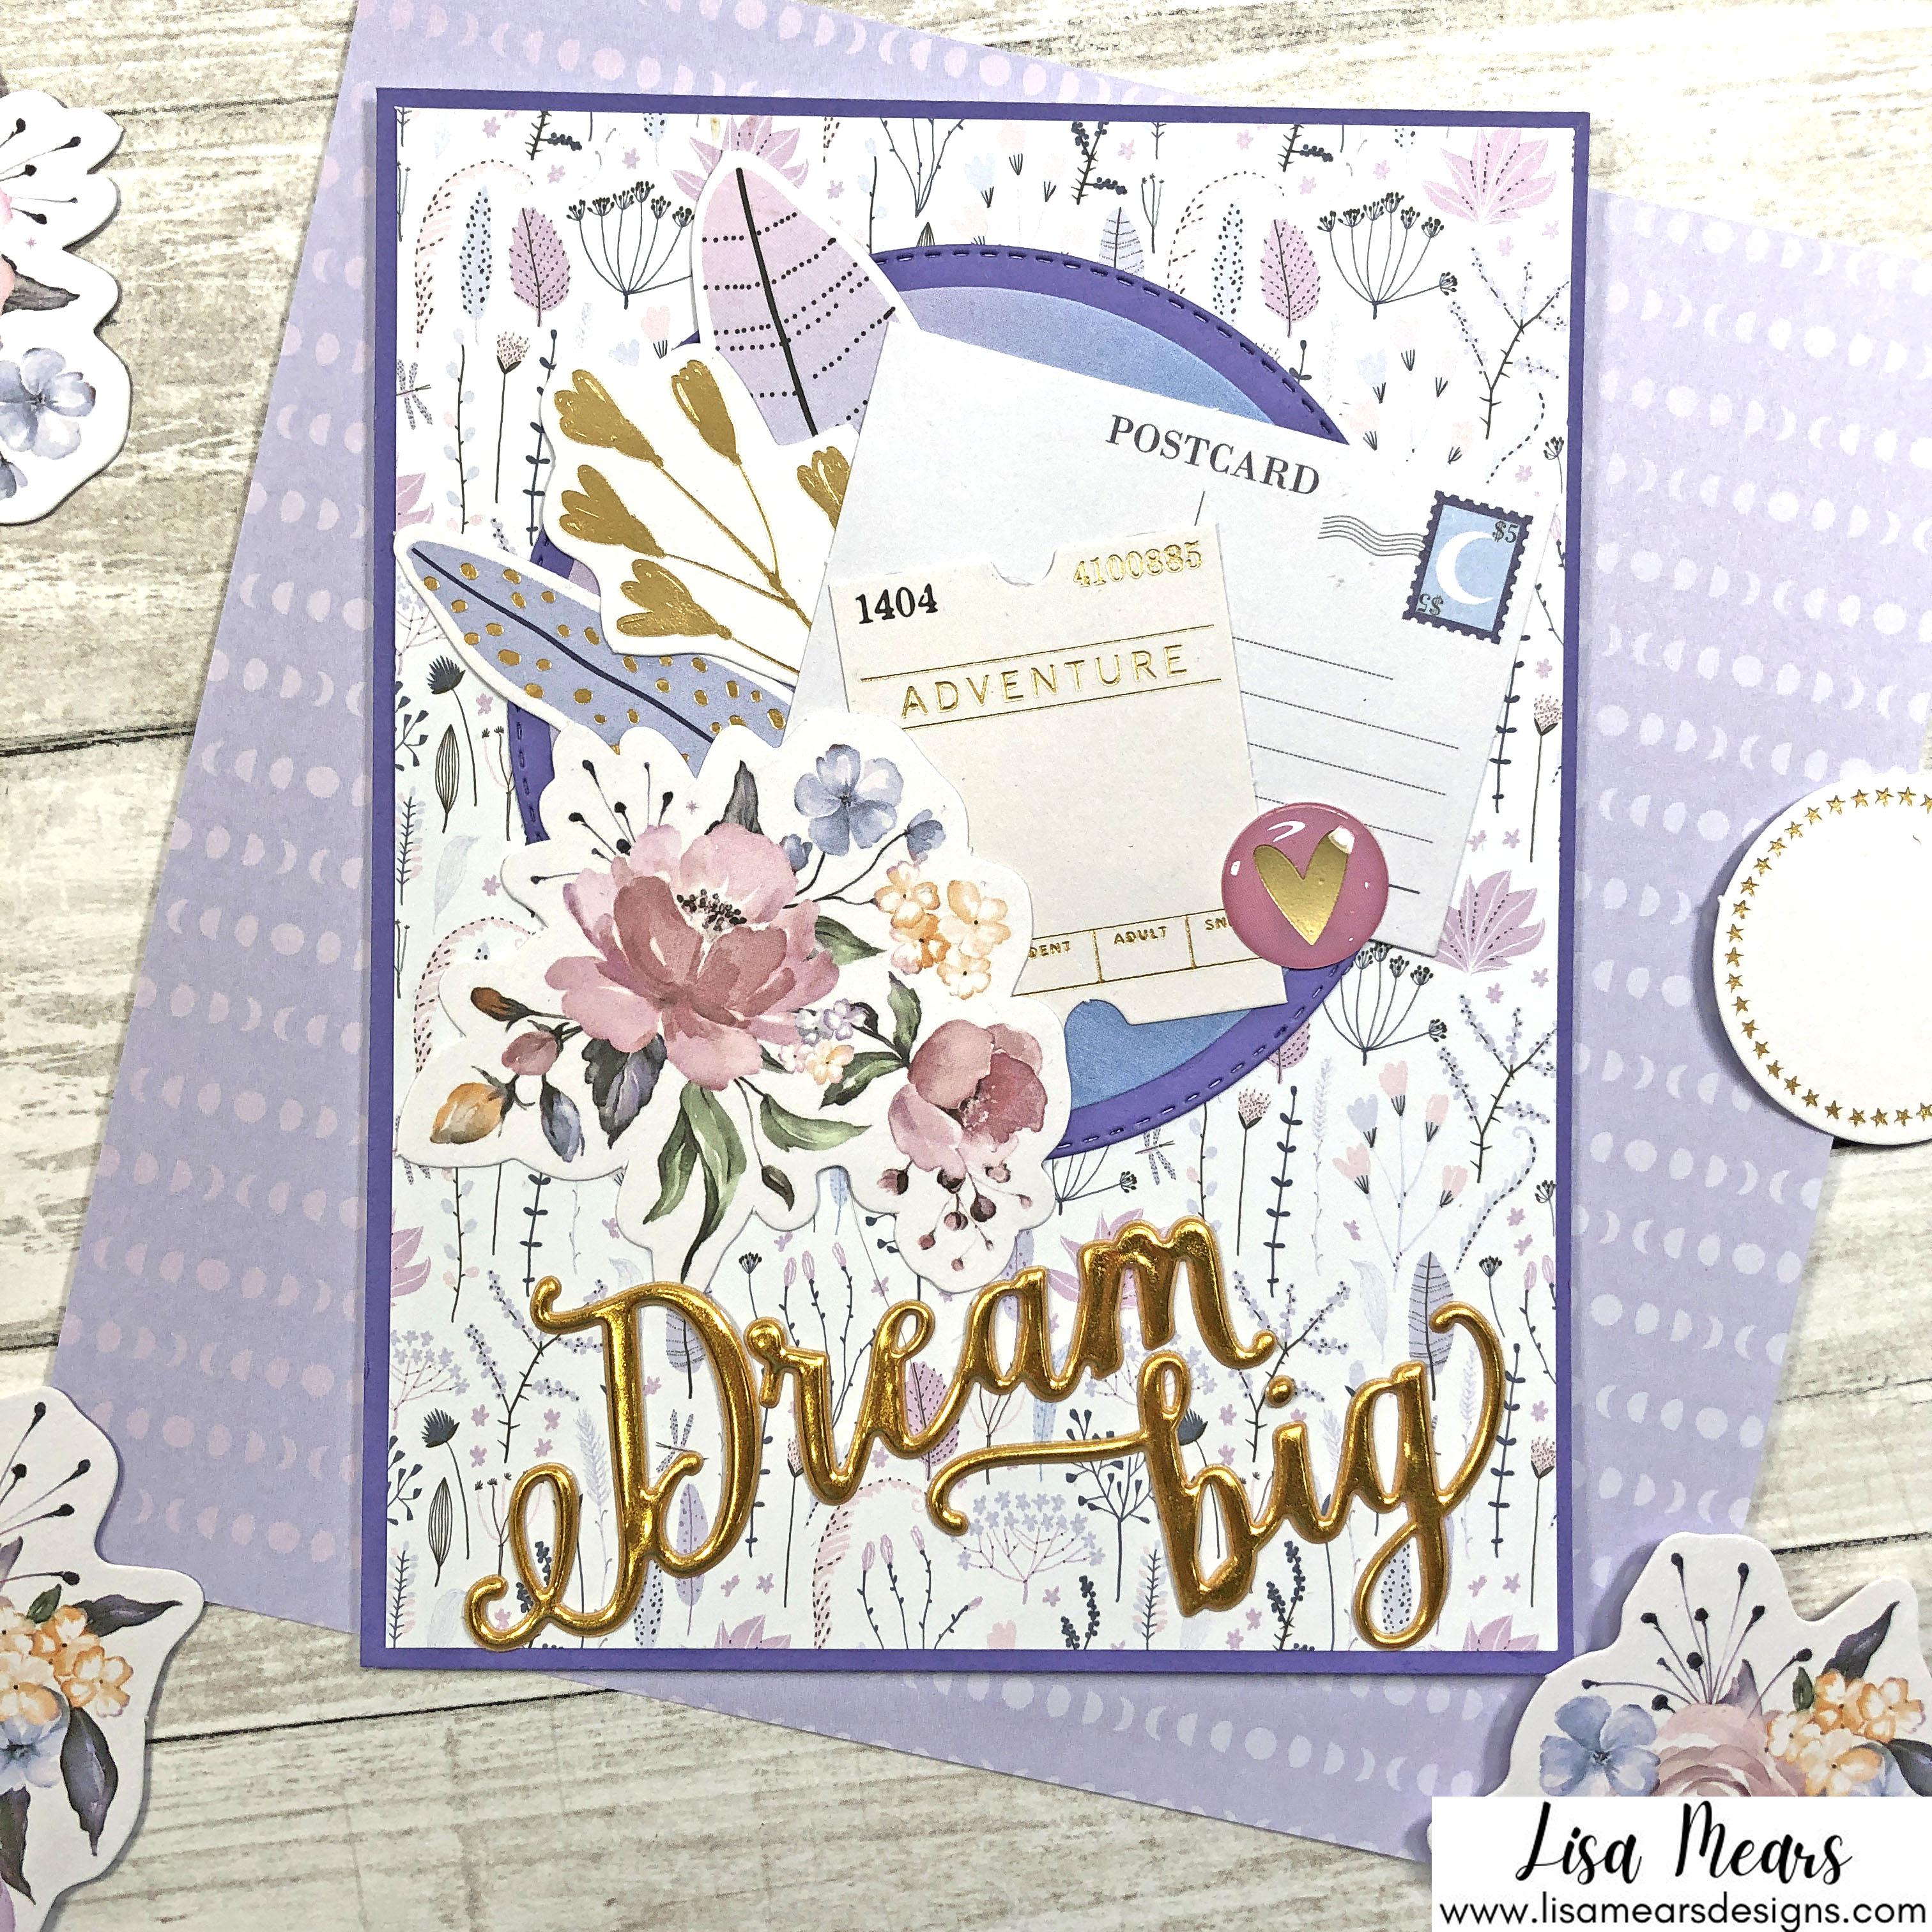 Spellbinders October 2021 Card Kit - You are Stellar! Dream Big Card